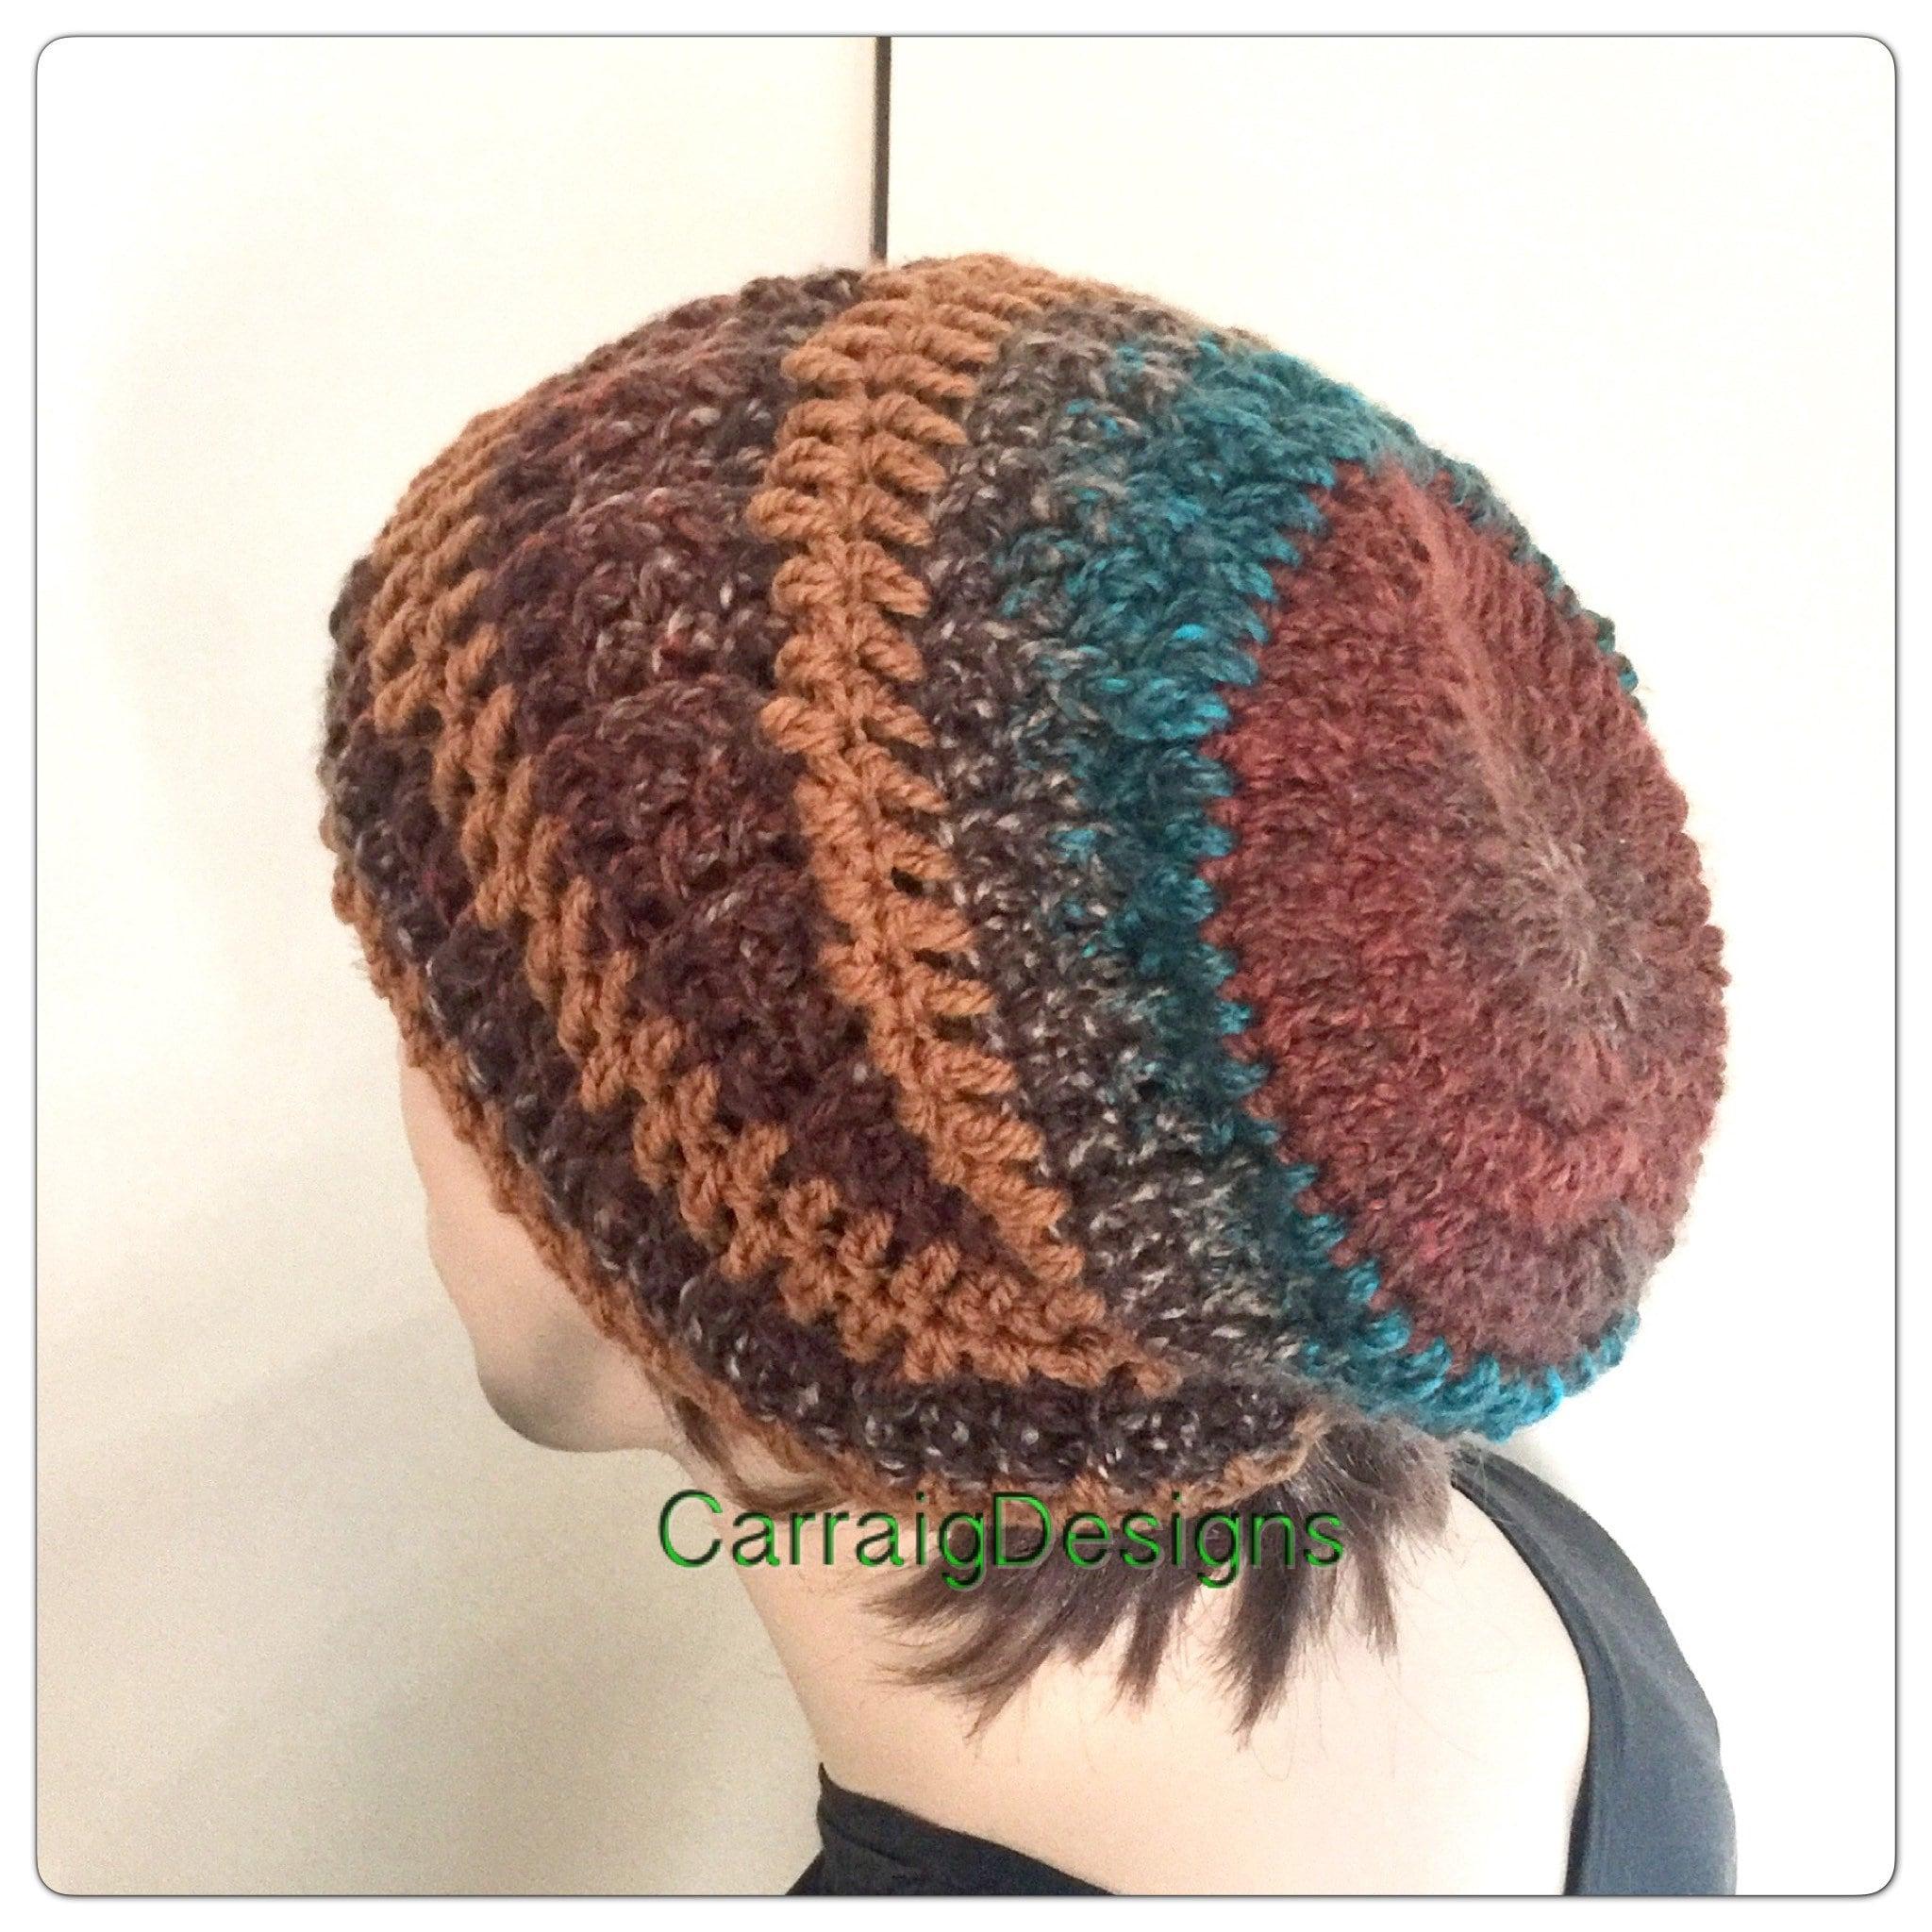 564dd9ae0d1 Mens slouch beanie hat man Designer hand crochet knitted oversized guy  slouchy striped gaming dread tam sale unisex women xmas gift ooak